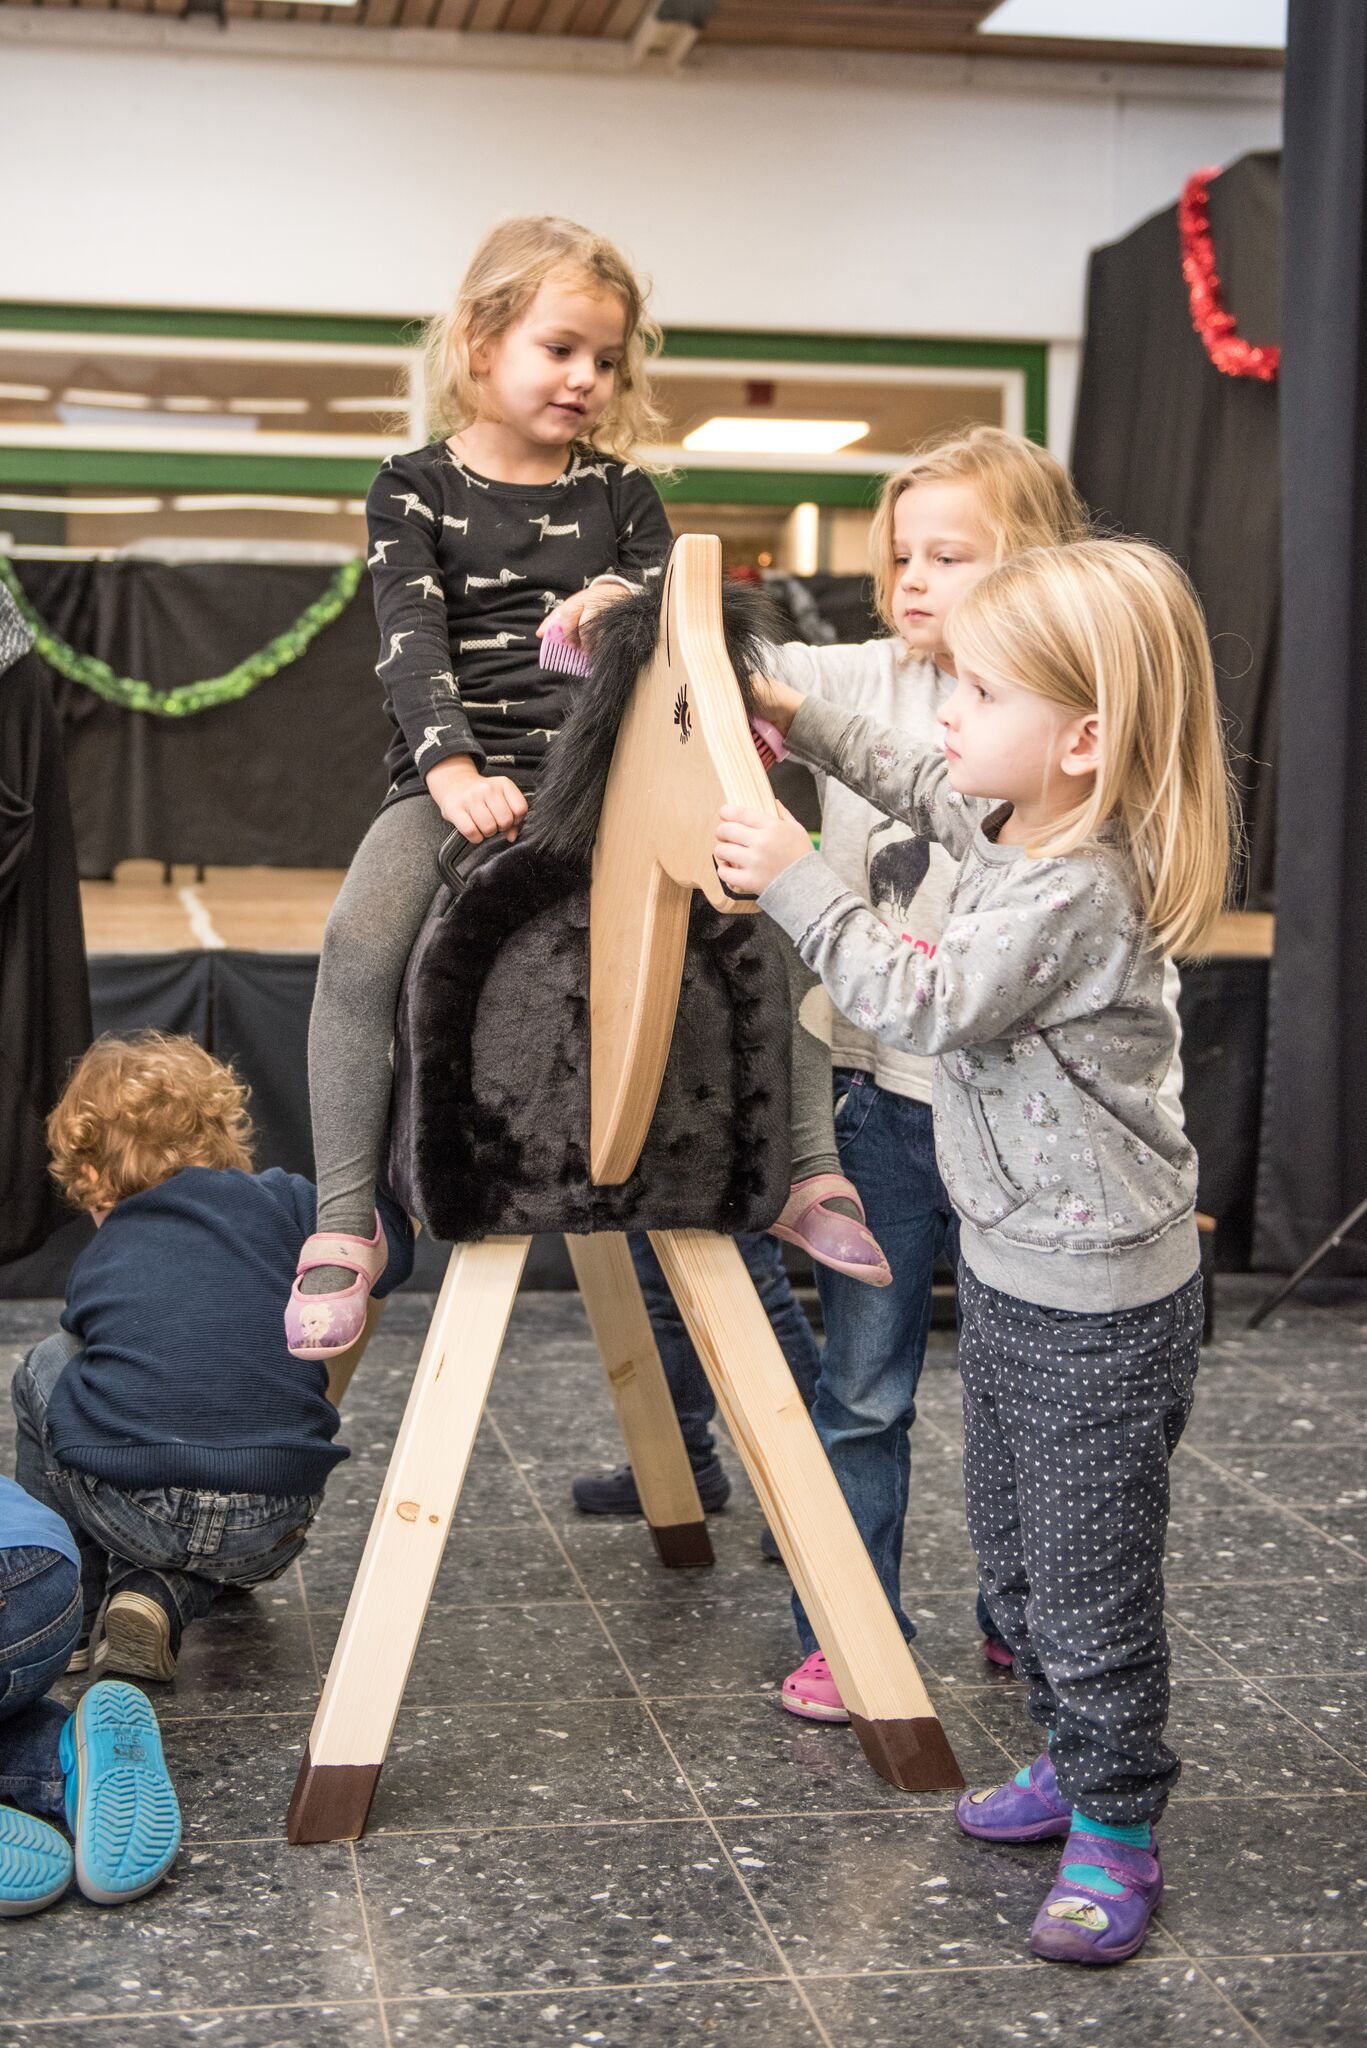 PfuKe.V. Vetoquinol Holzpferdeübergabe 2017 Juechen (2)